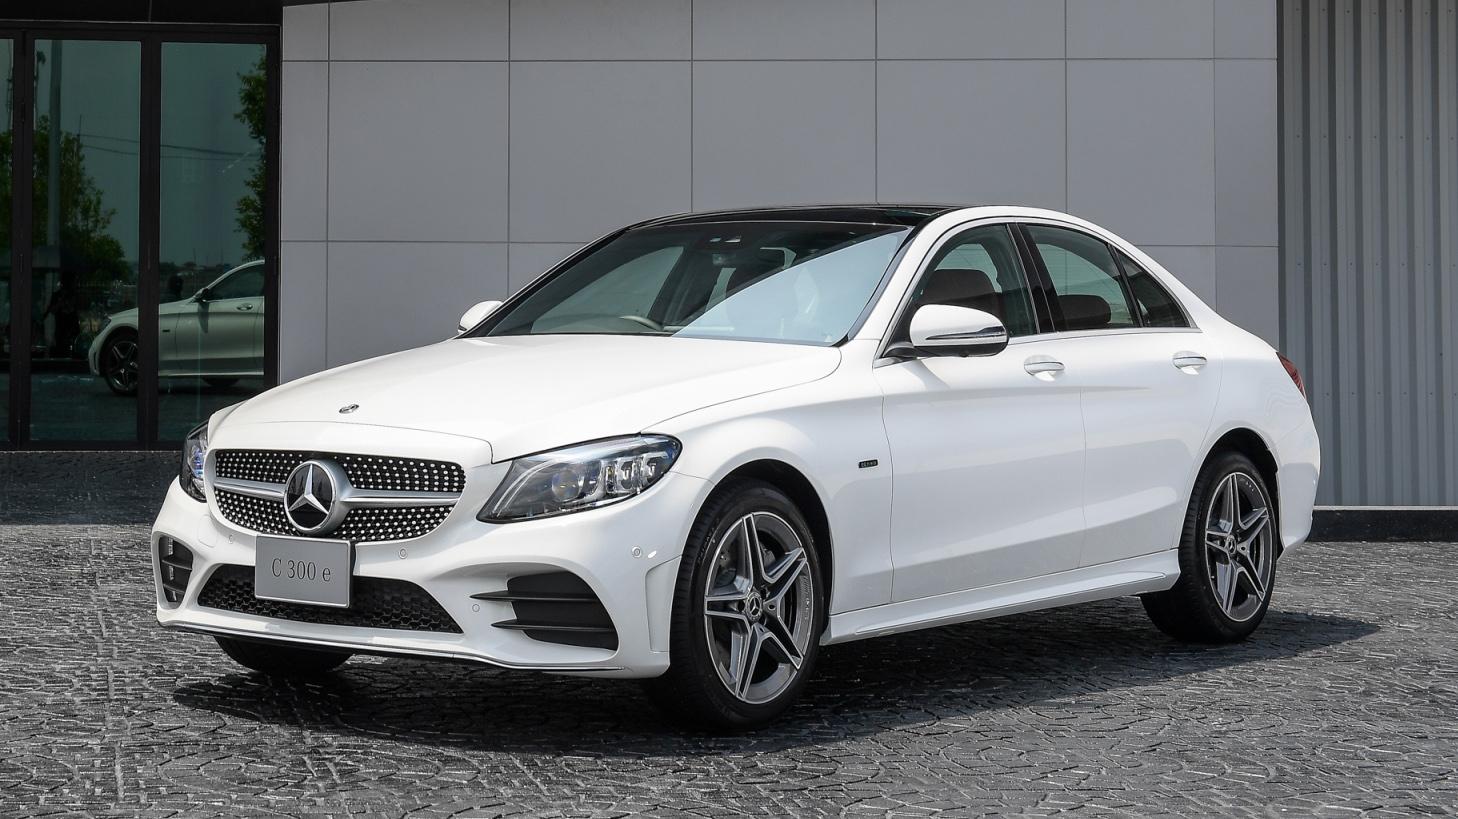 2019 Mercedes Benz C300e Plug In Hybrid Thai Prices And Specs Bangkok Post Auto Benz Mercedes Benz Mercedes